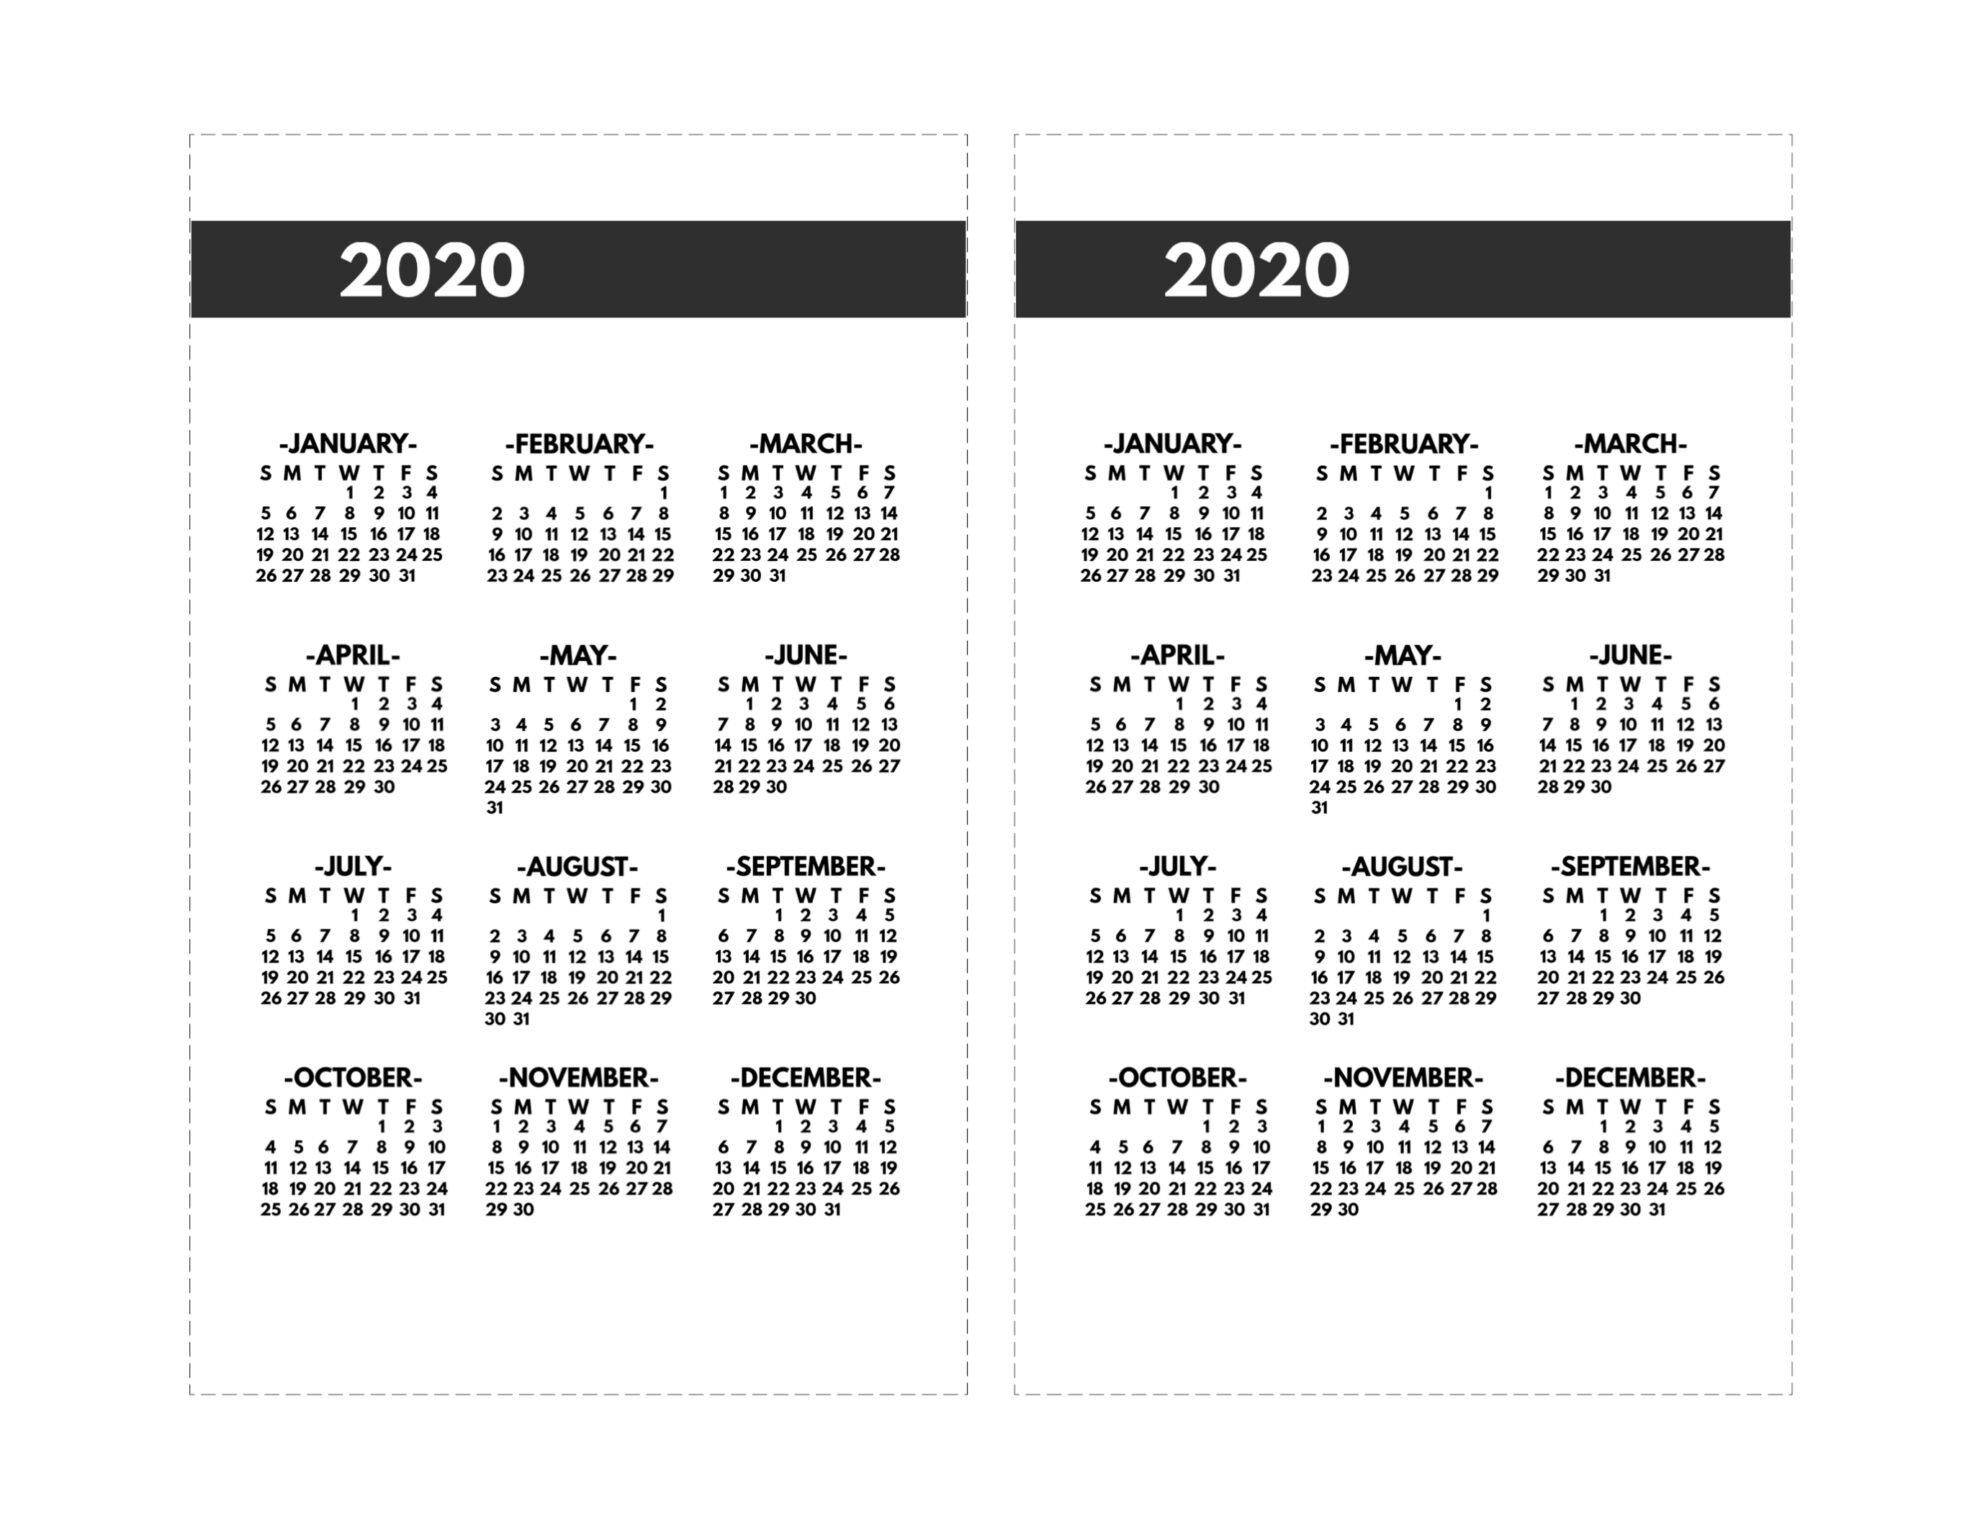 2020 Calendar 8 1/2 X 11 | Free Printable Calendar A Self Printed 8 1/2 X 11 Calender